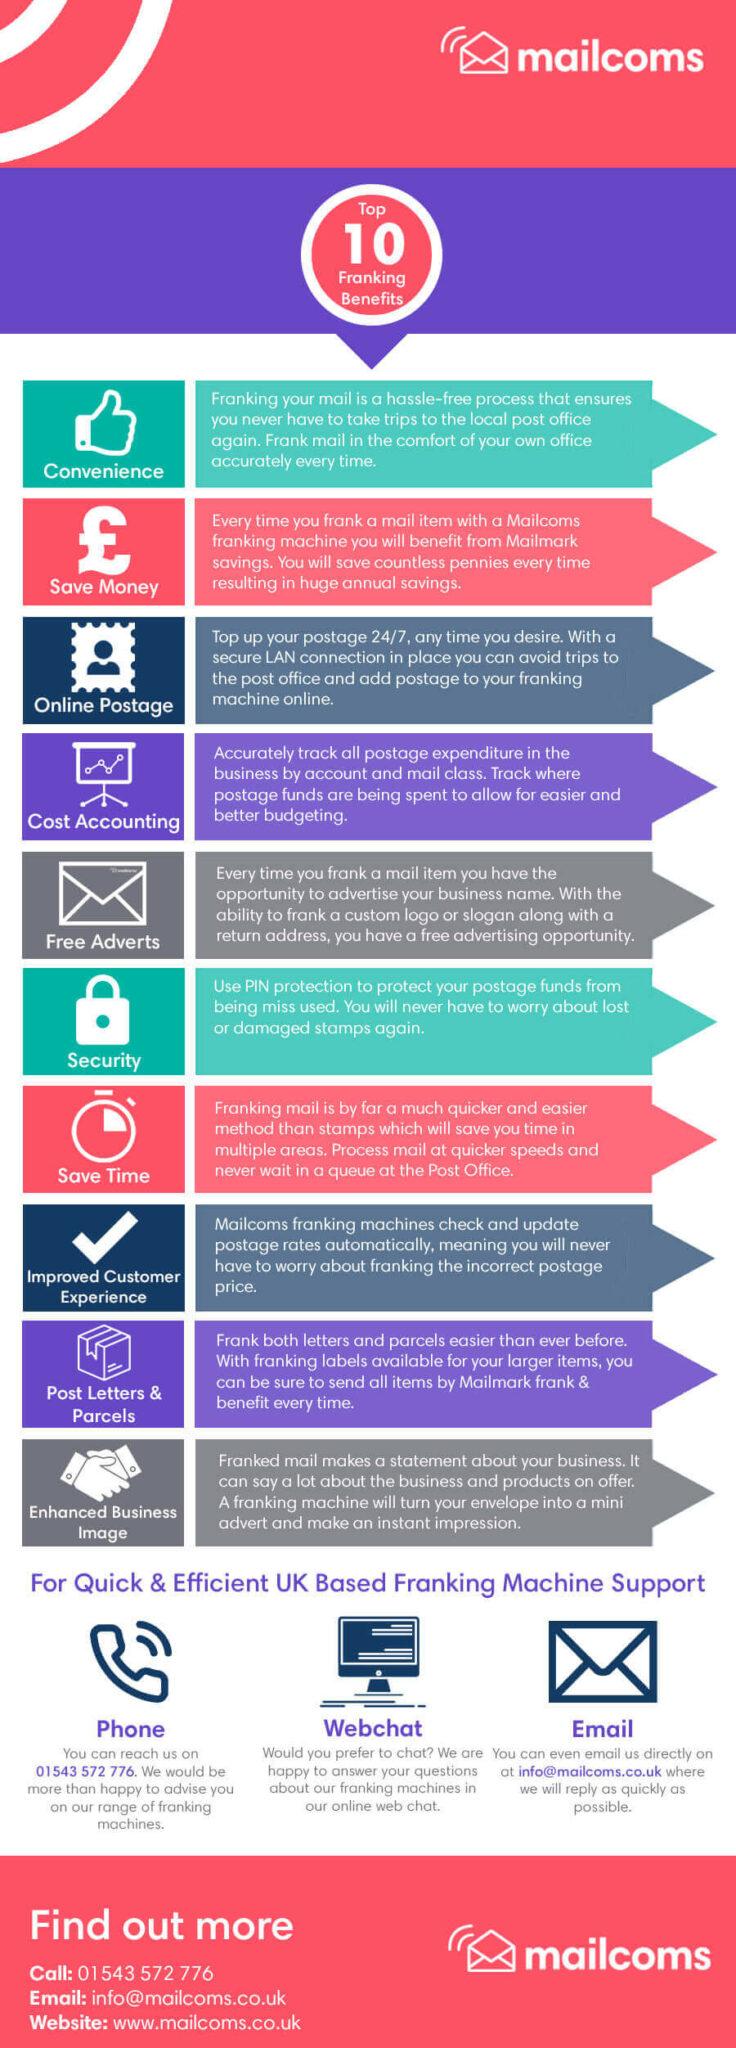 Top 10 Franking Machine Benefits